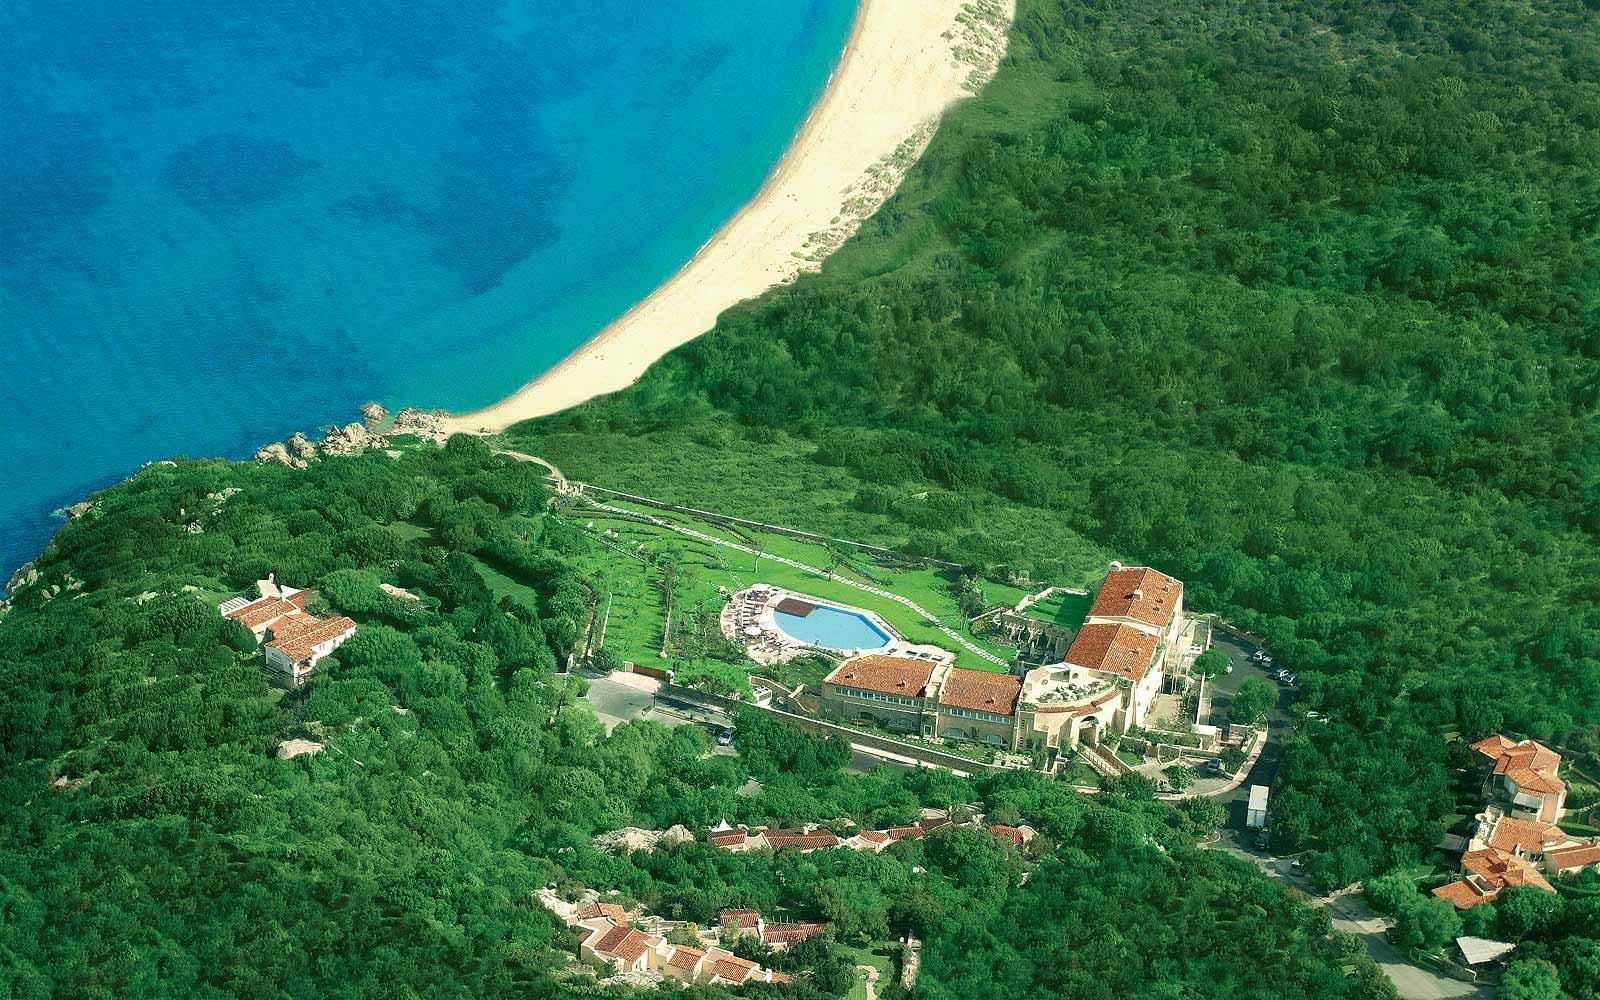 Panoramic view of the L'Ea Bianca Luxury Resort